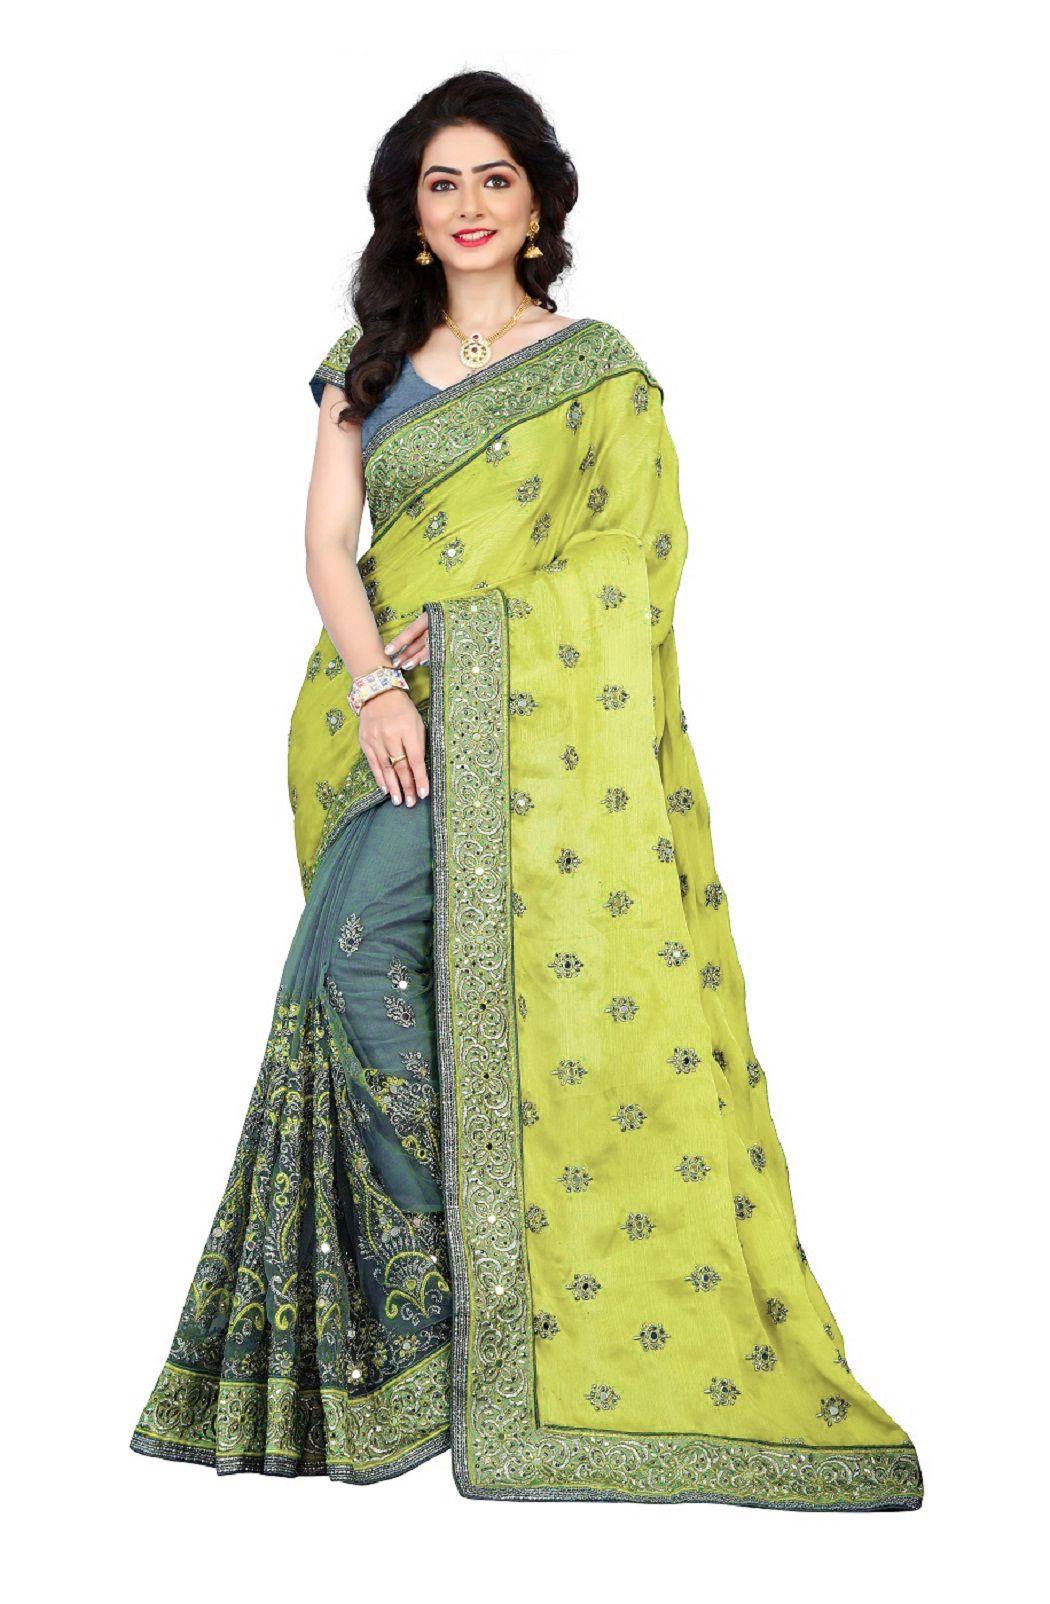 Hani Fashion Green and Yellow Satin Saree